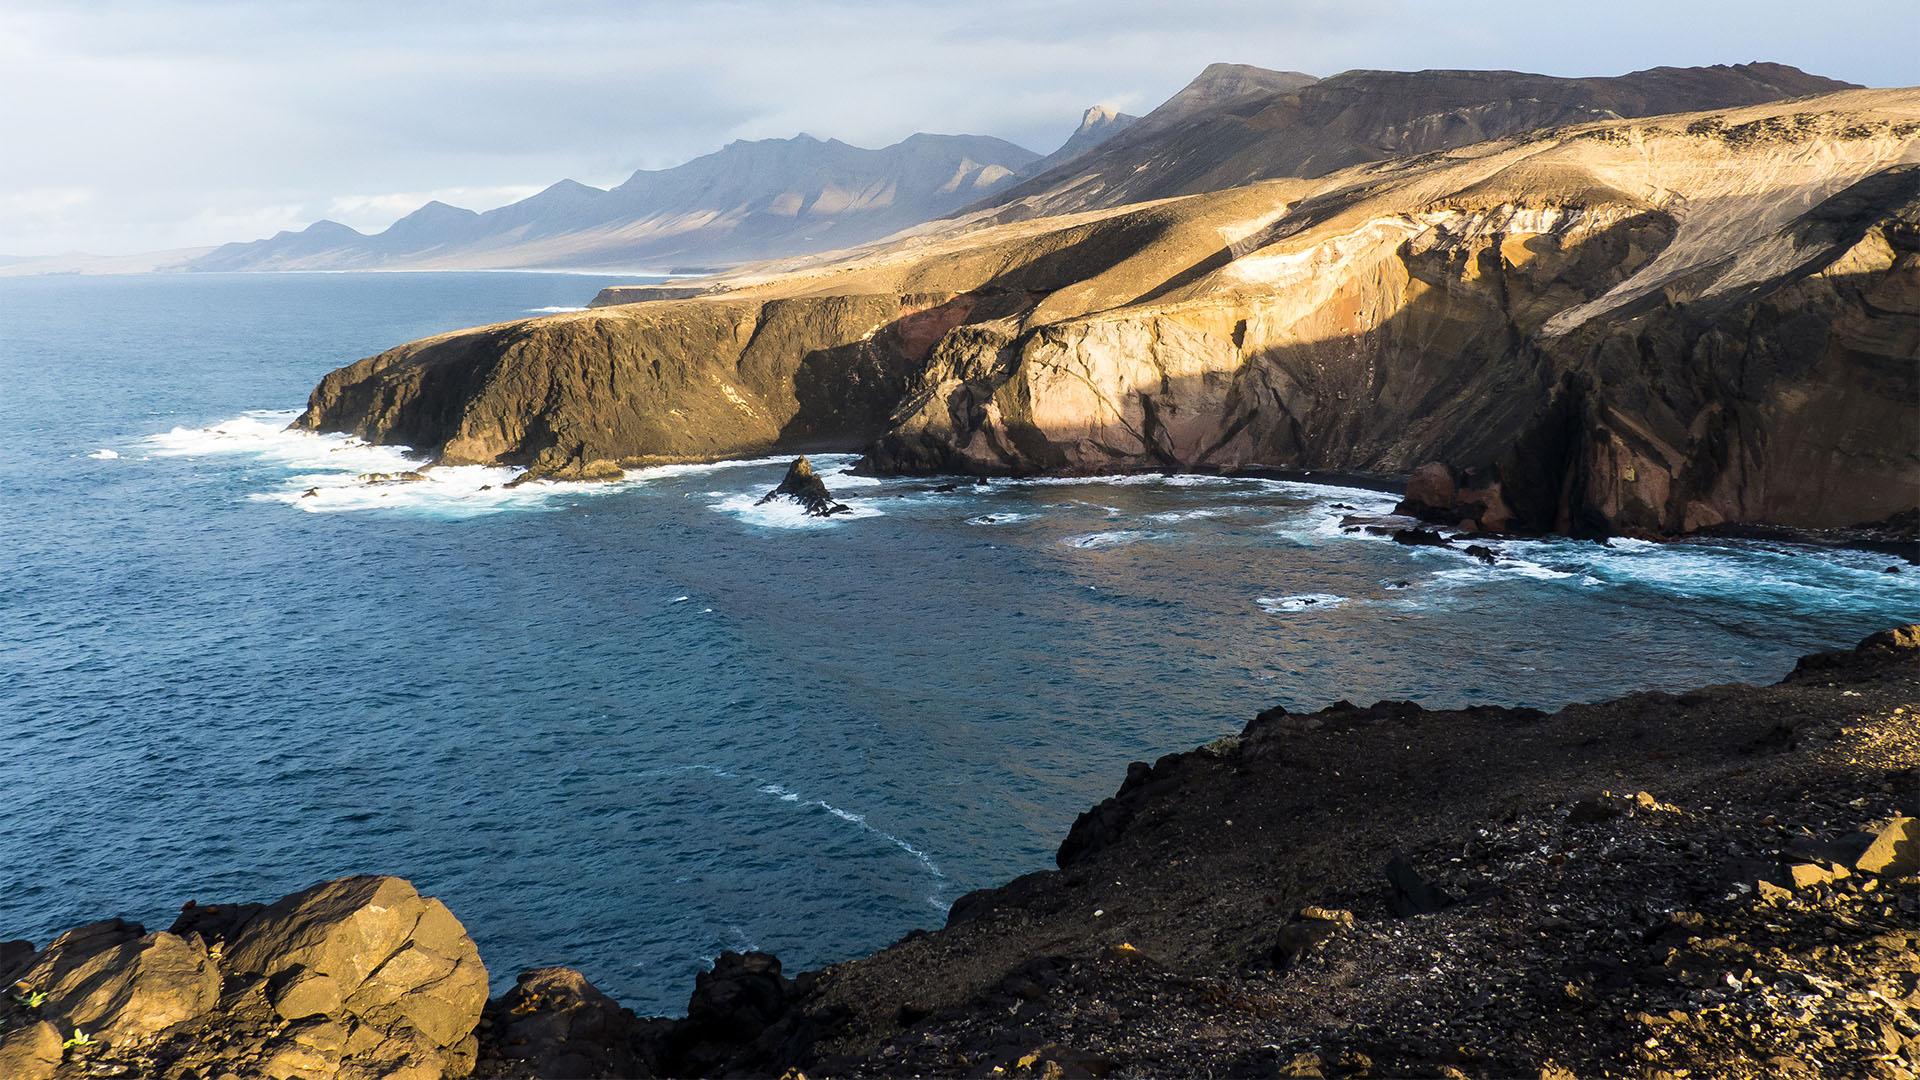 Die Strände Fuerteventuras: Las Talahijas – Caleta de la Madera.